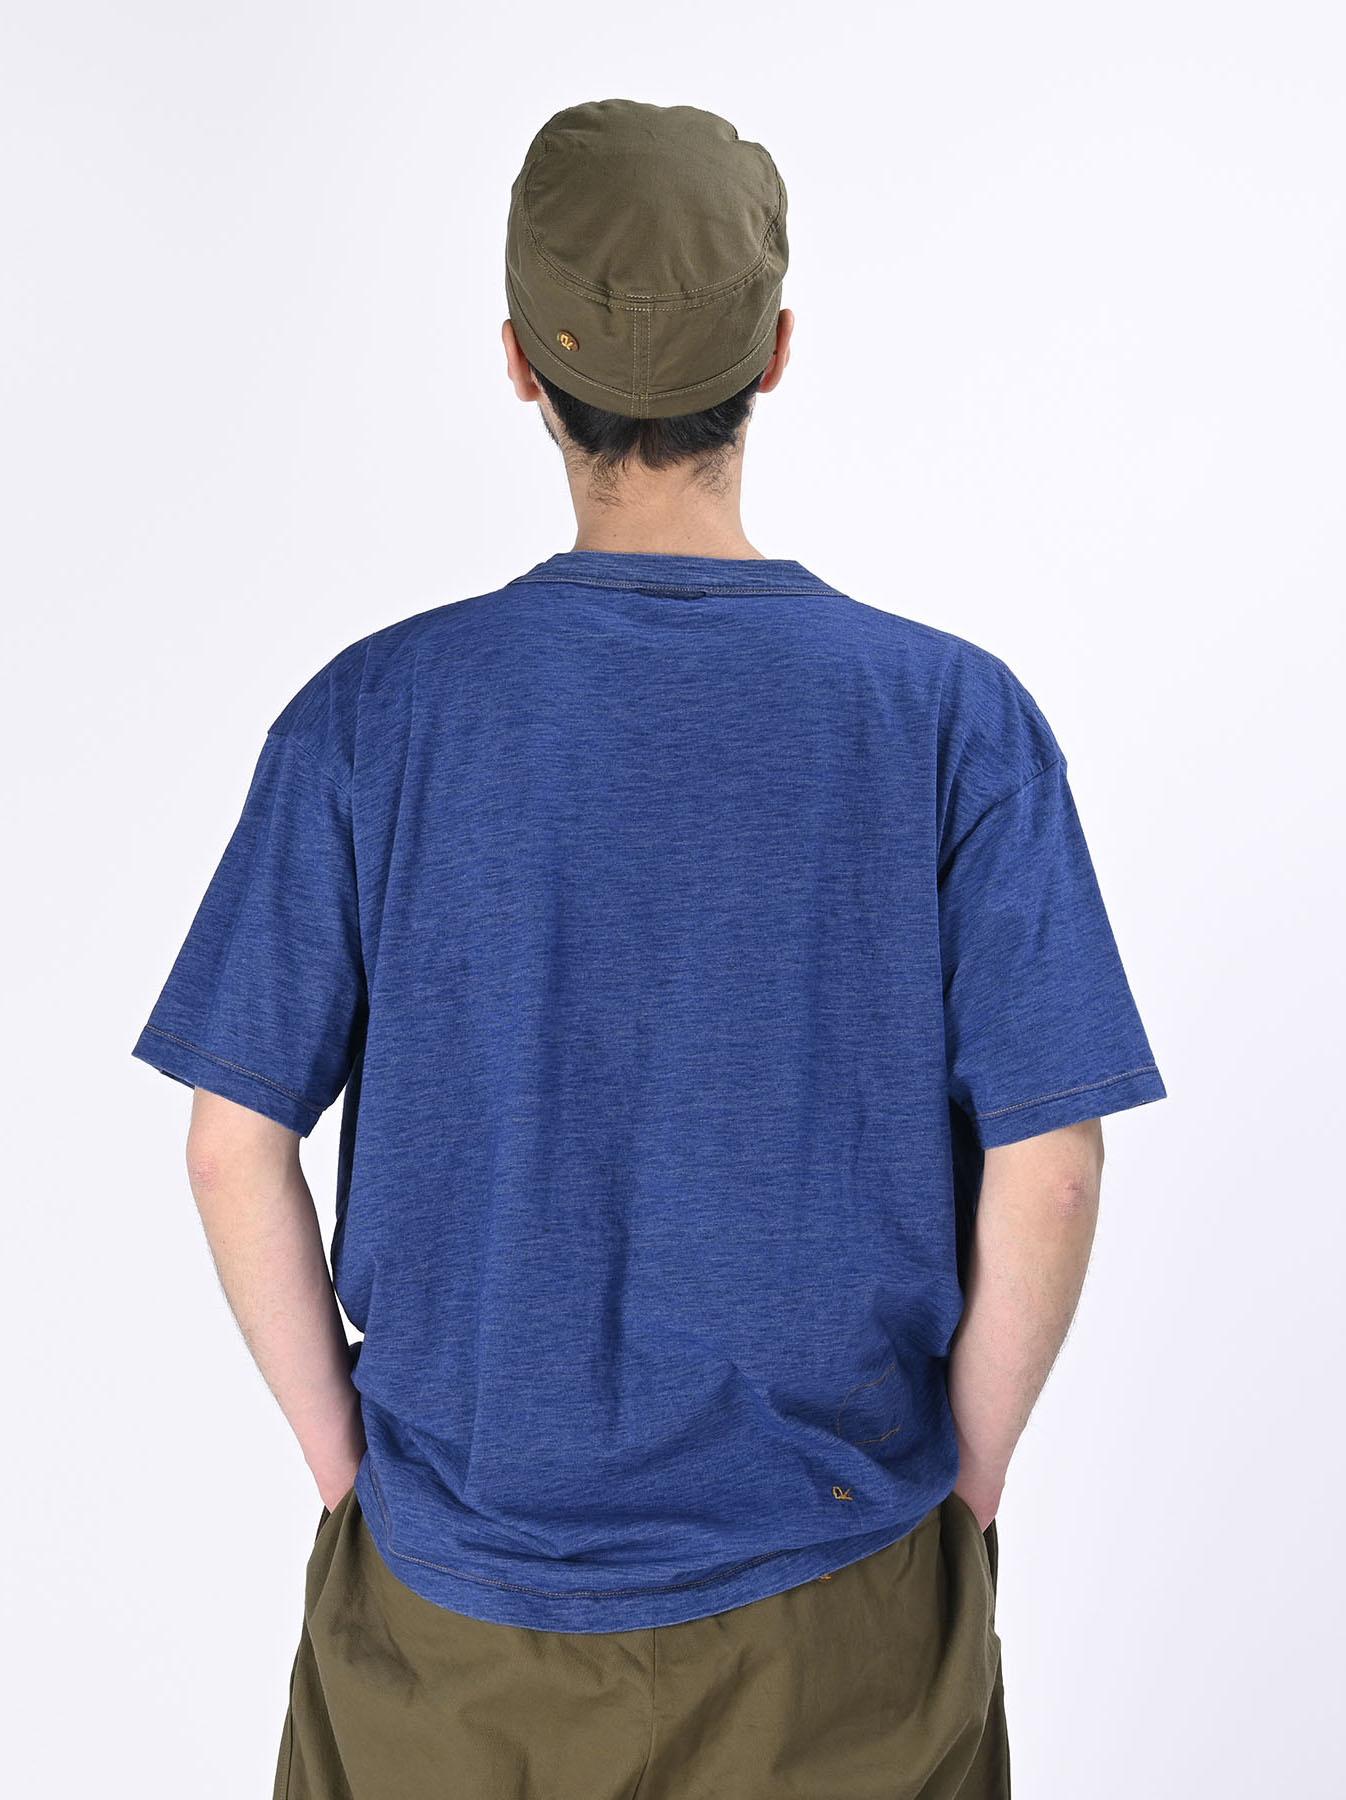 Distressed Indigo Ukiyo de Surf 908 Ocean T-shirt (0621)-5